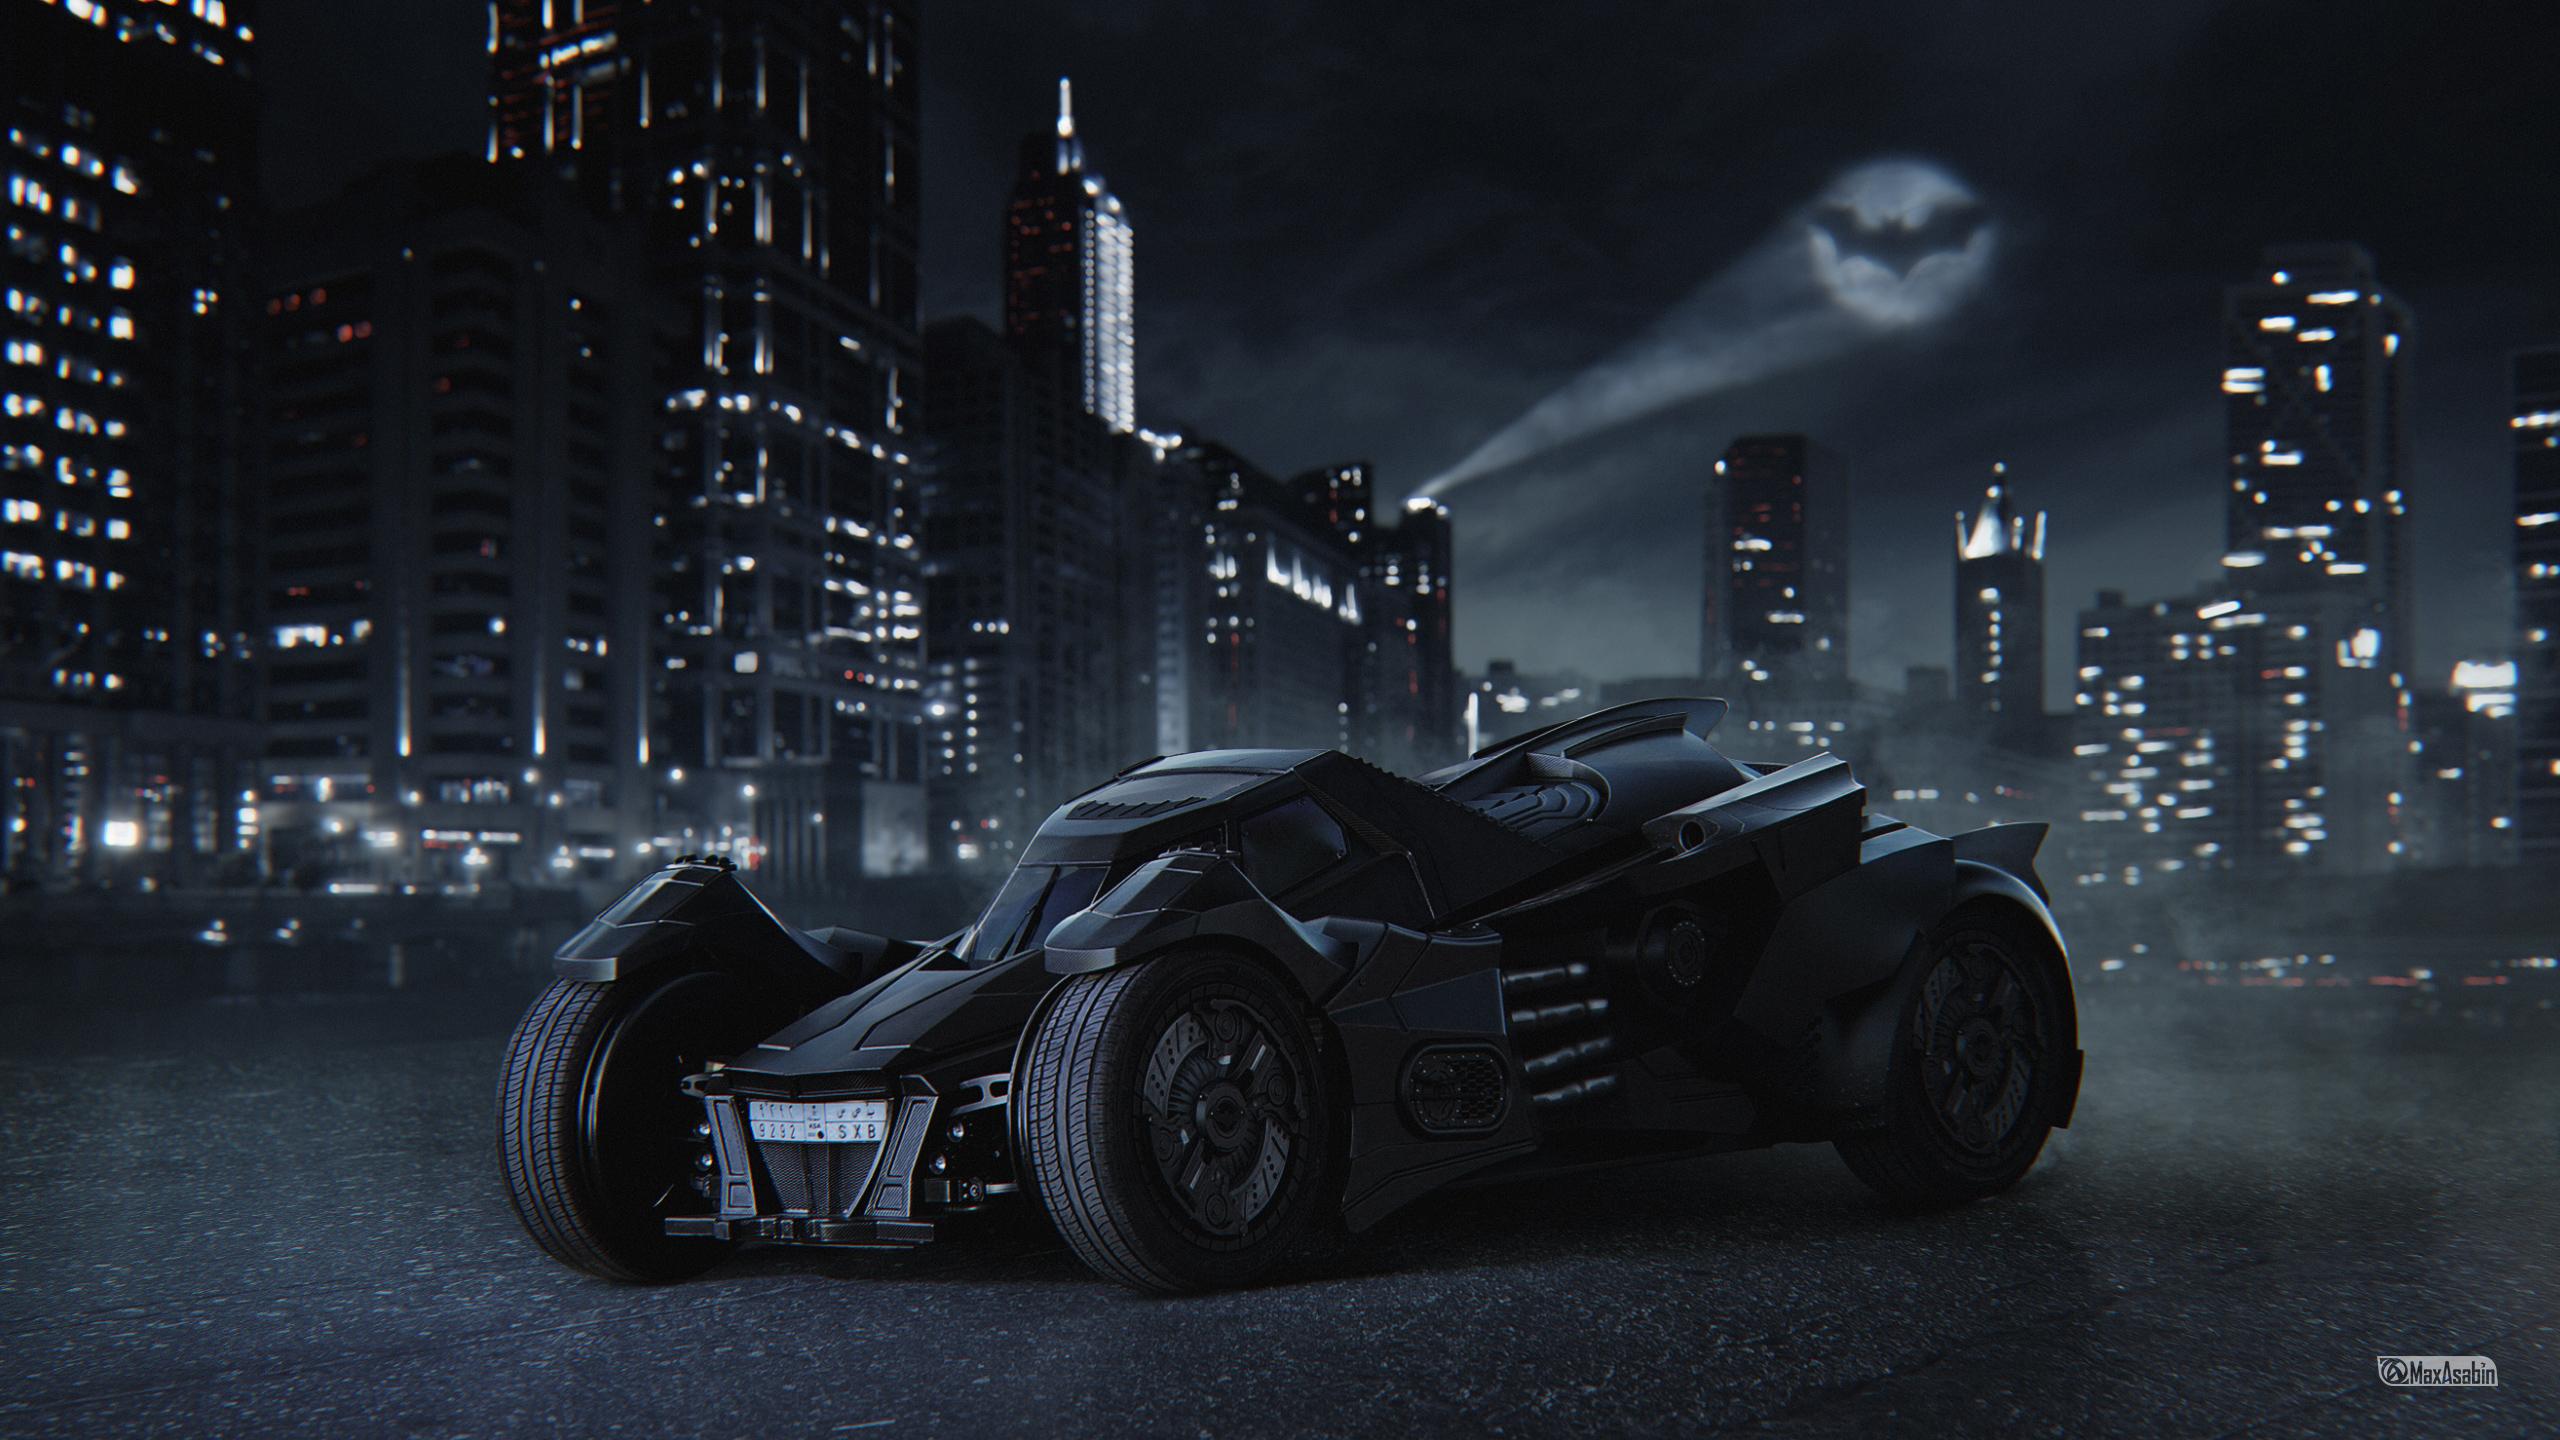 Batmobile Batman Ride, HD Superheroes, 4k Wallpapers ...